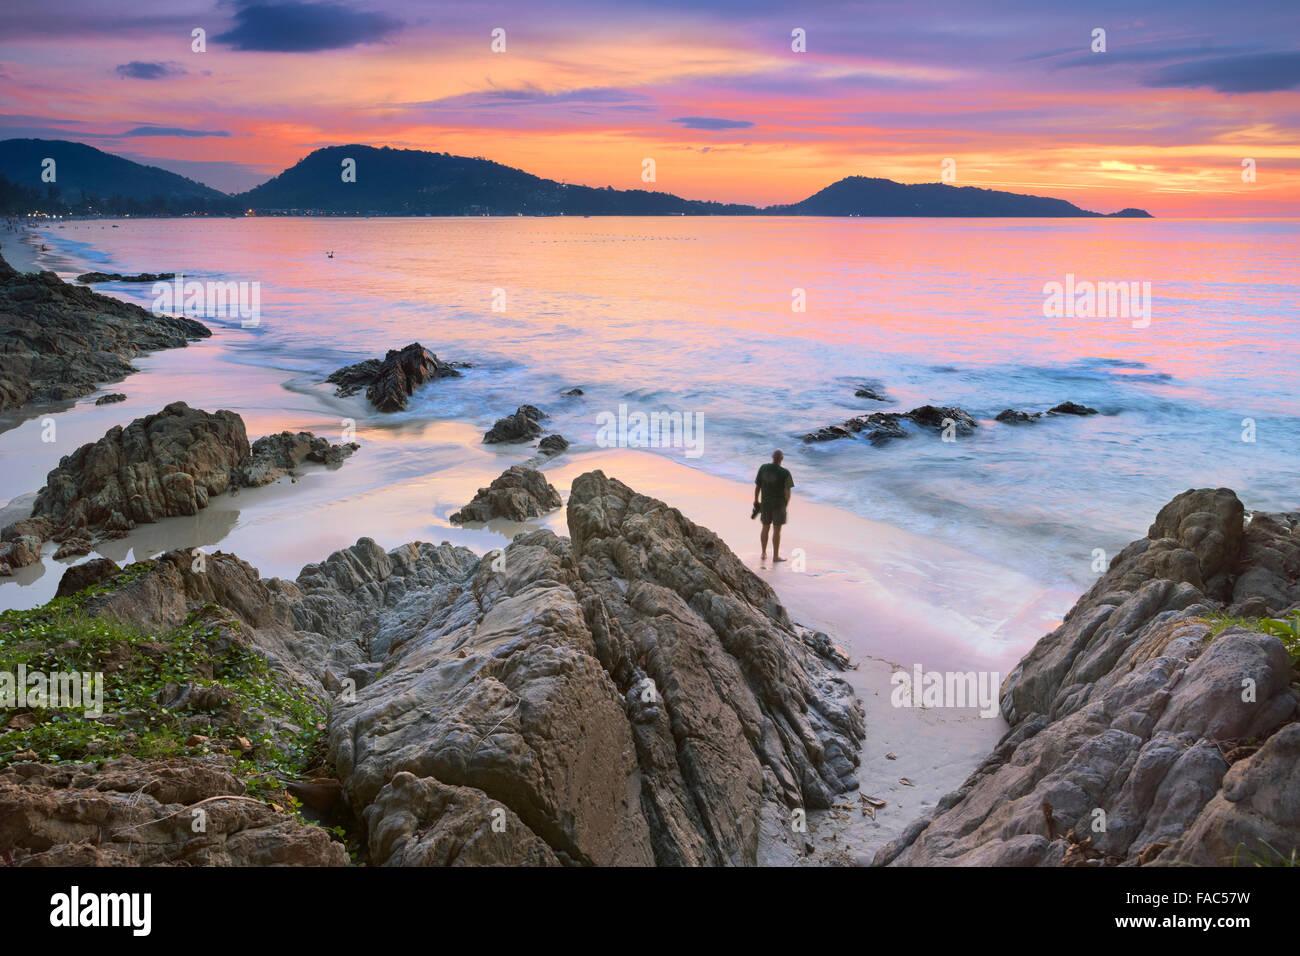 Tailandia - La isla de Phuket, Patong Beach, Sunset tiempo paisaje Foto de stock